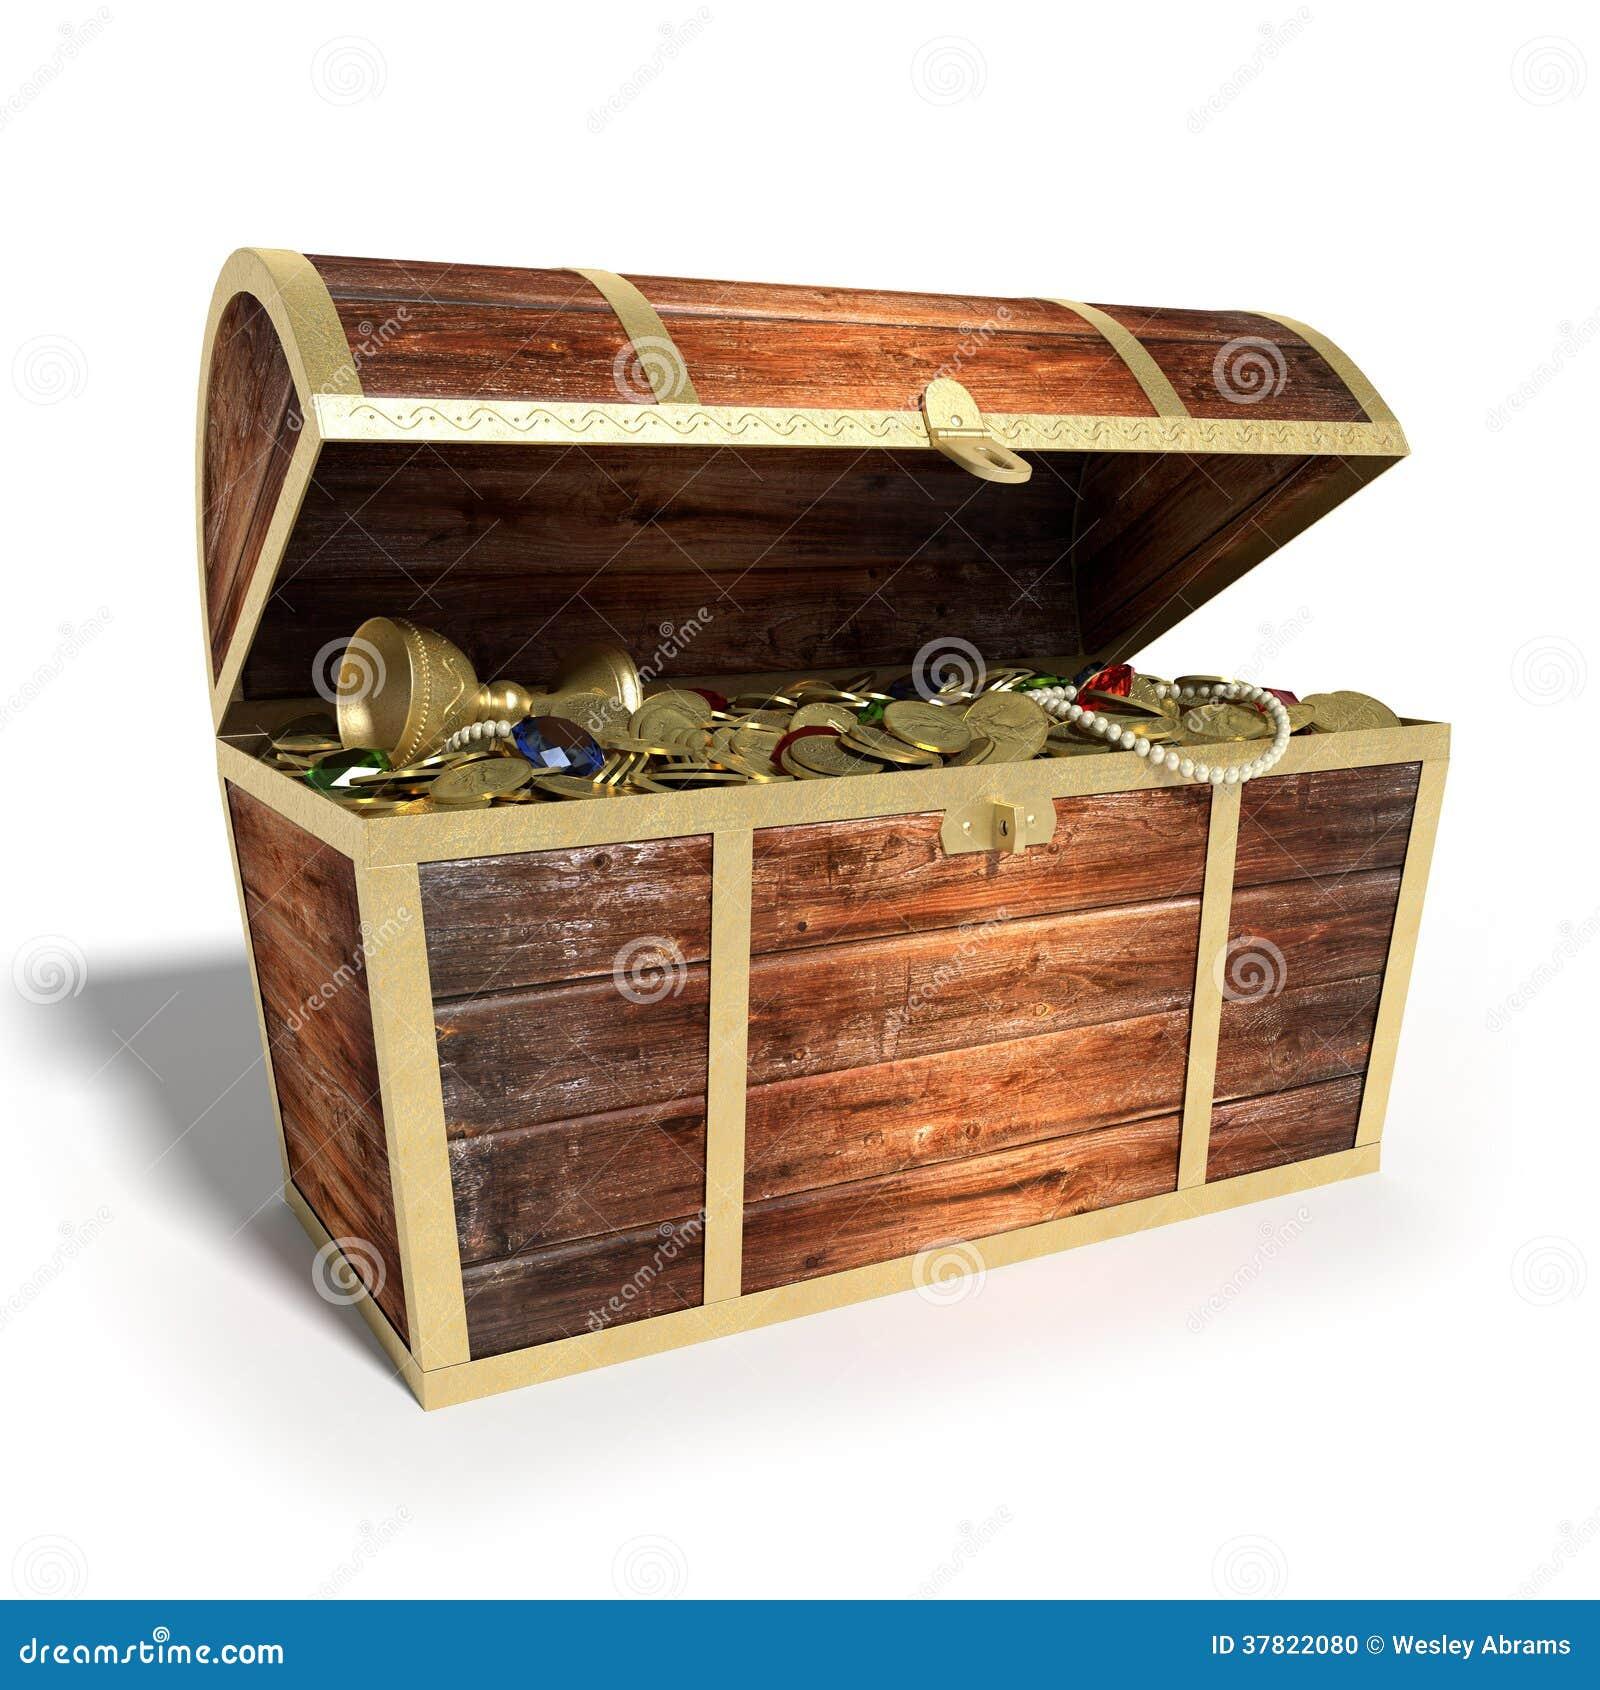 Treasure Chest Stock Photo - Image: 37822080